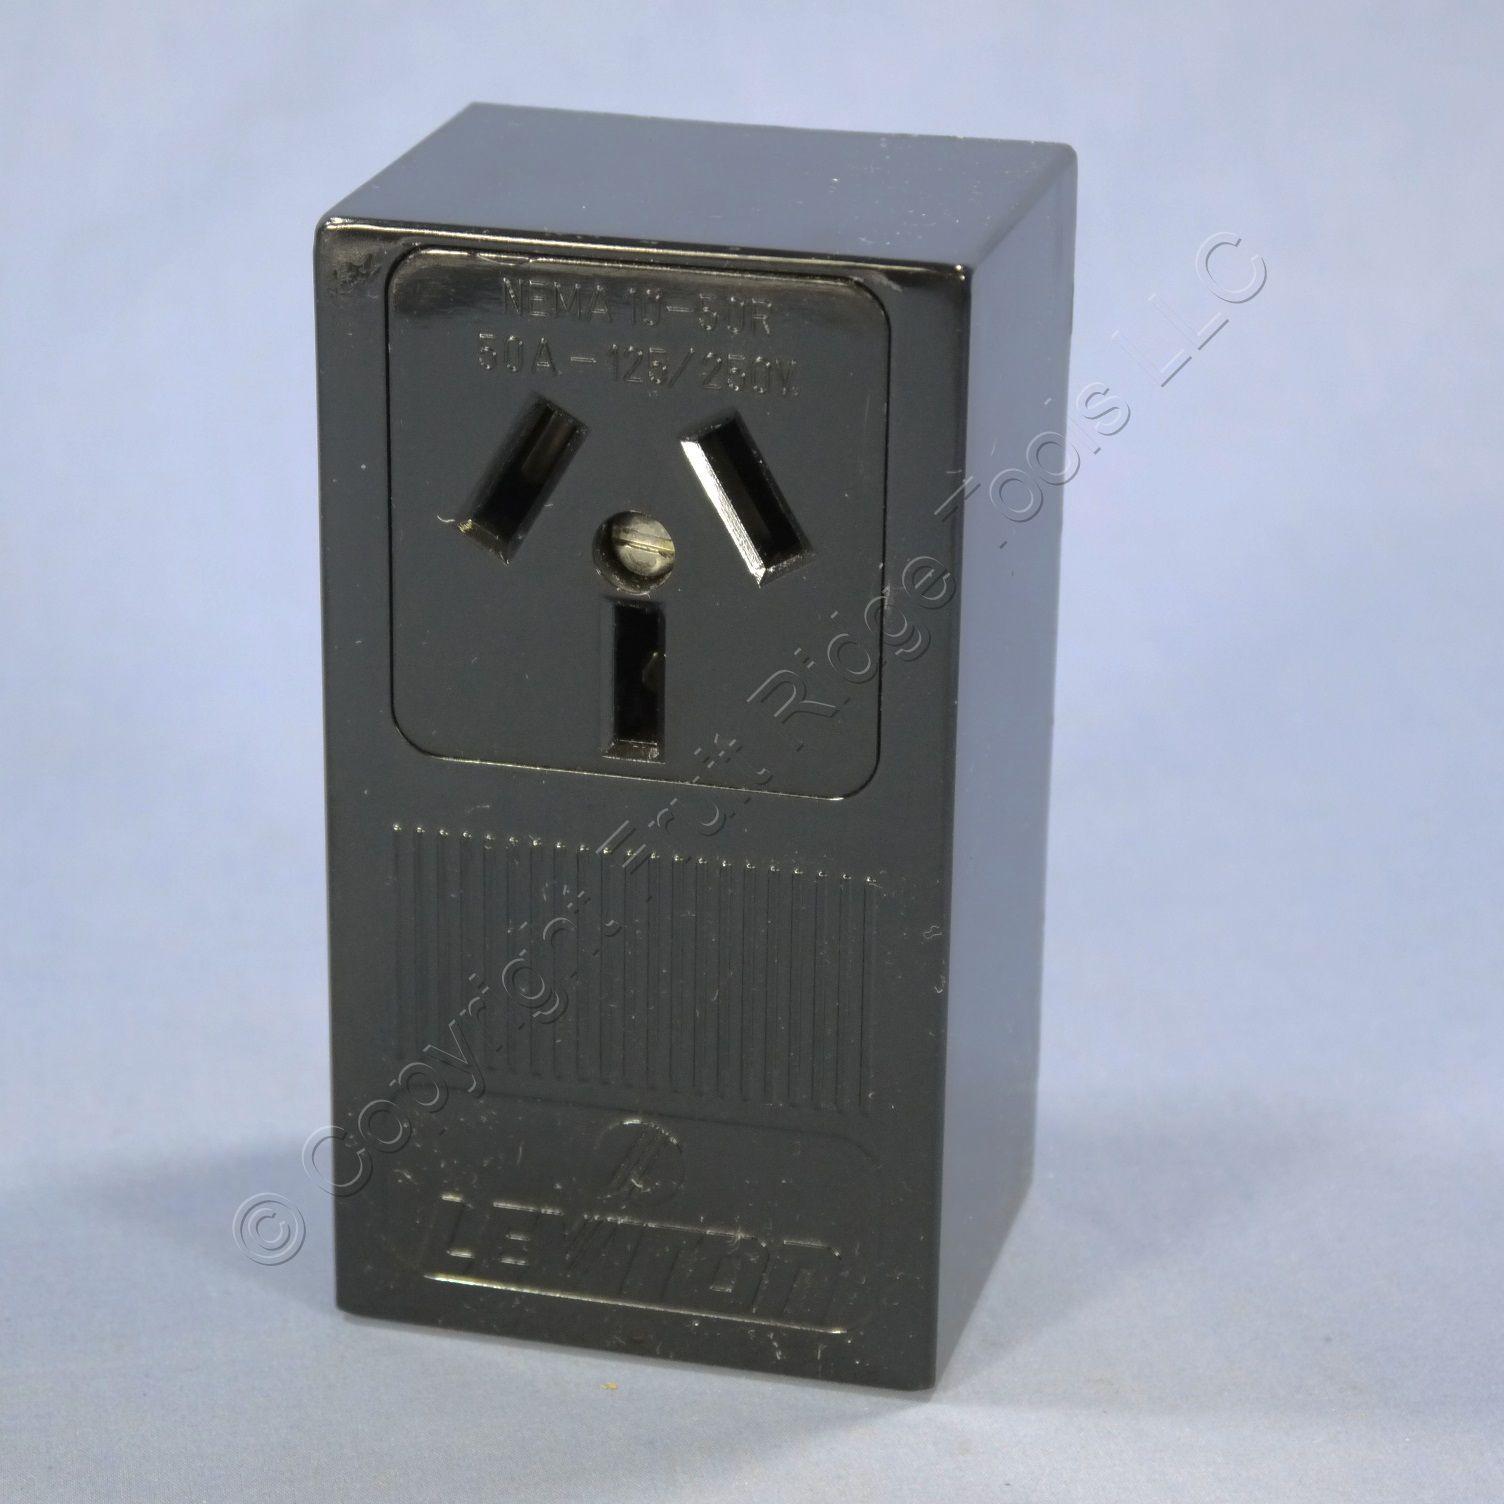 L5050 EA 4 leviton range dryer 10 50 surface mount receptacle outlet nema 10 leviton 30a 125 250v plug wiring diagram at crackthecode.co